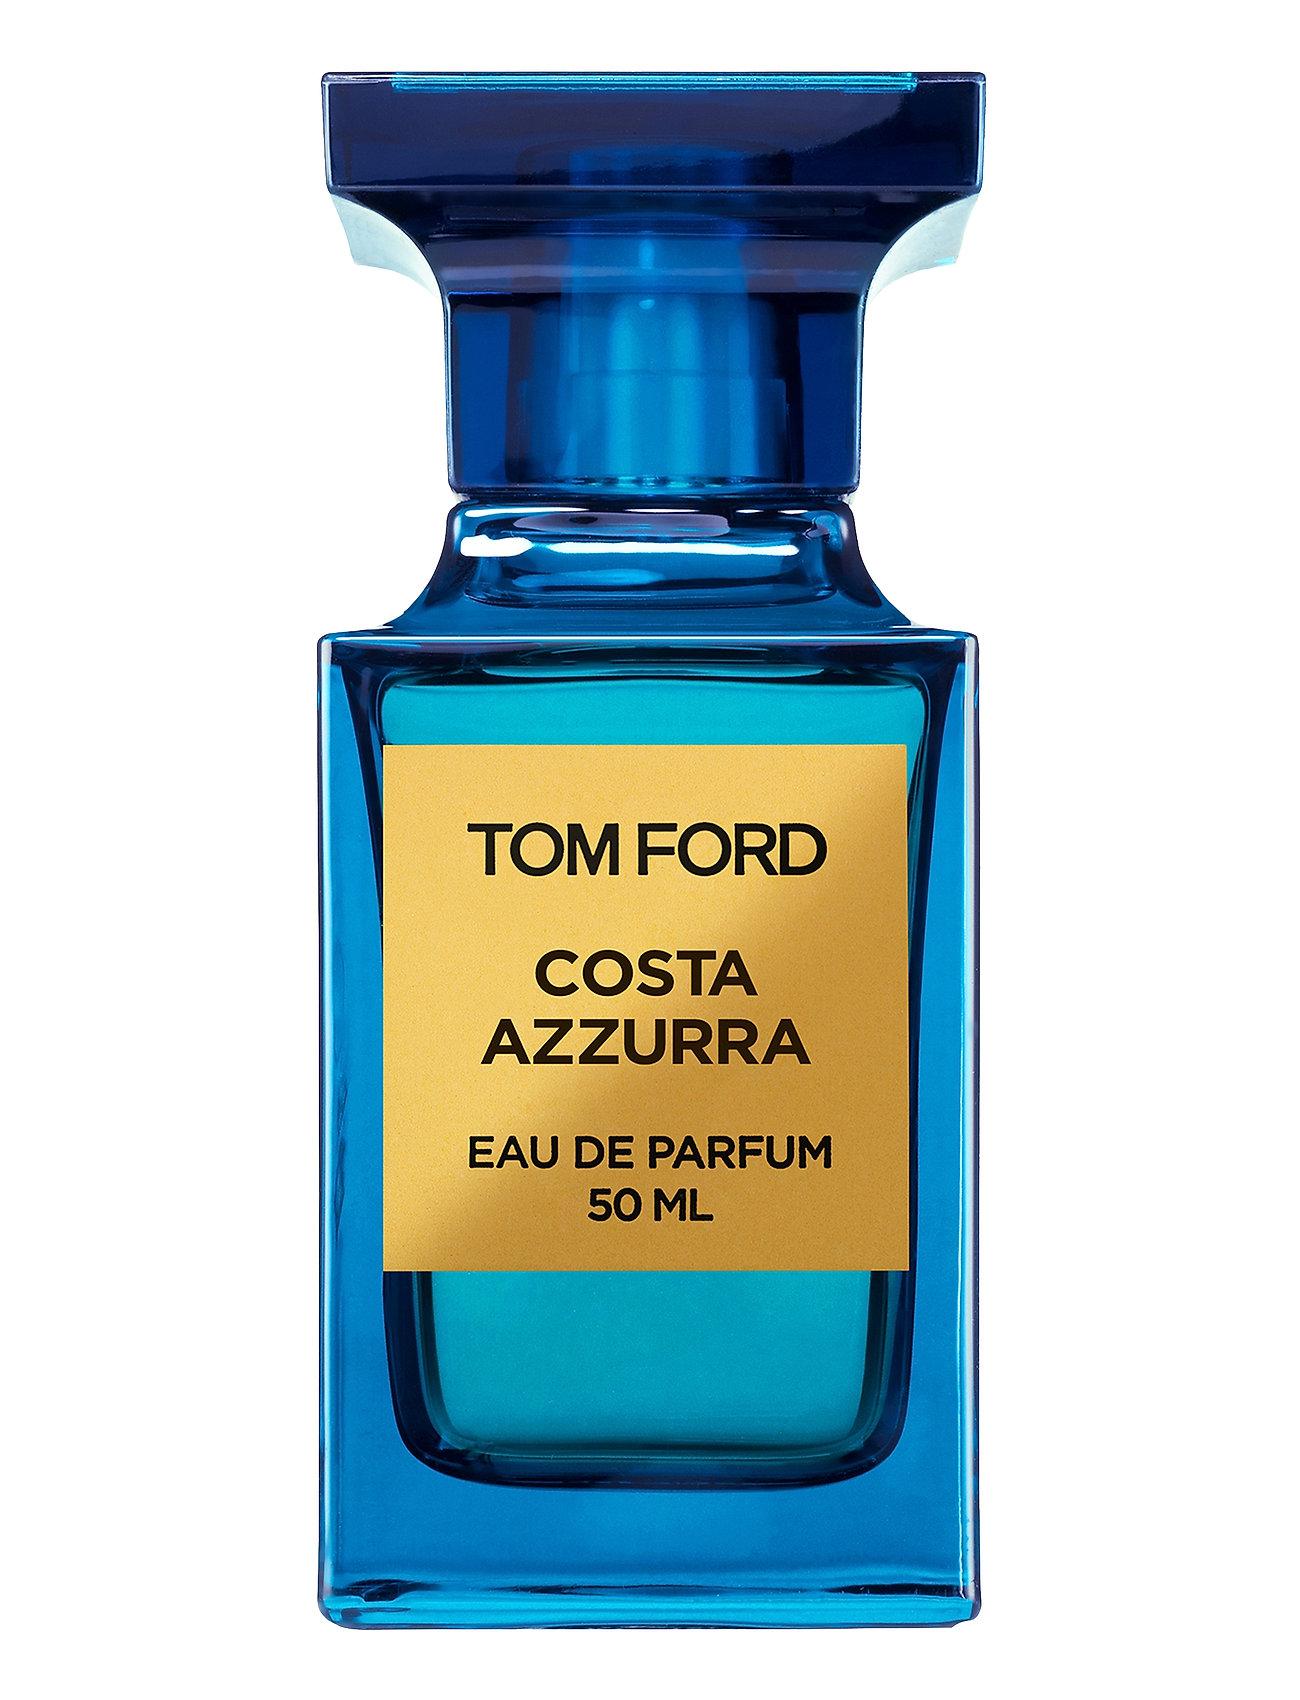 tom ford – Costa azzurra eau de parfum fra boozt.com dk